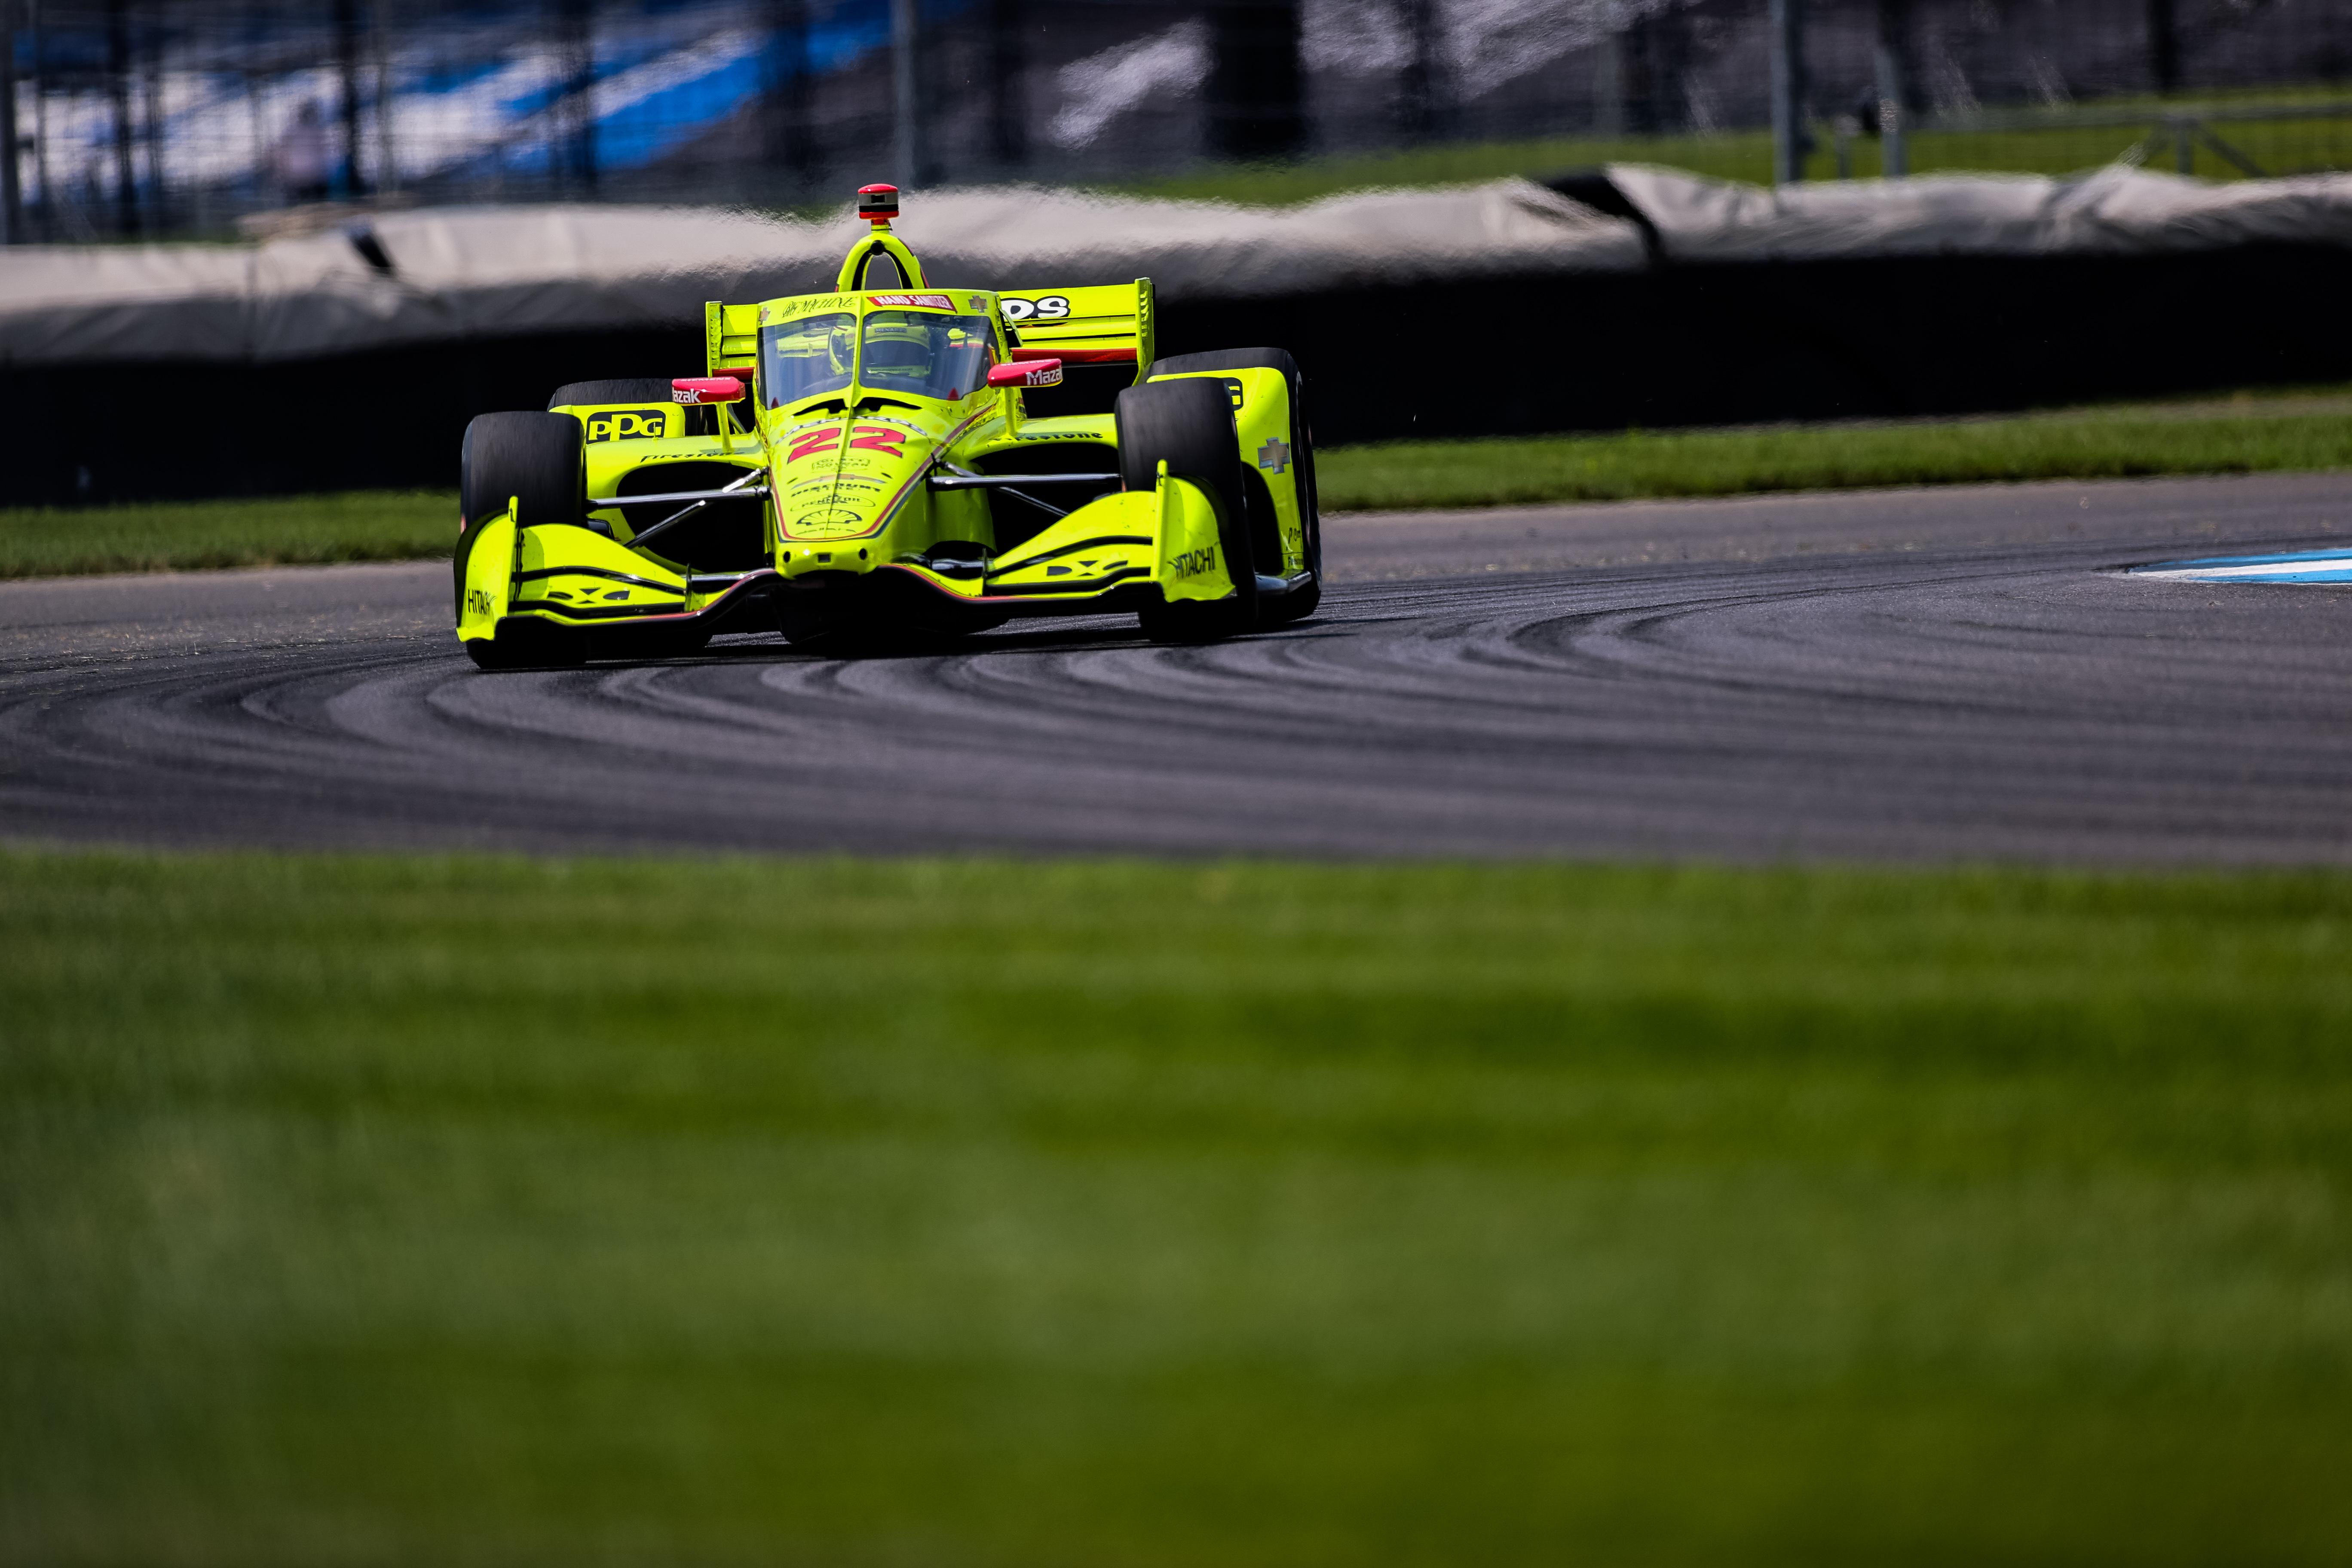 Simon Pagenaud Penske Indianapolis IndyCar 2020